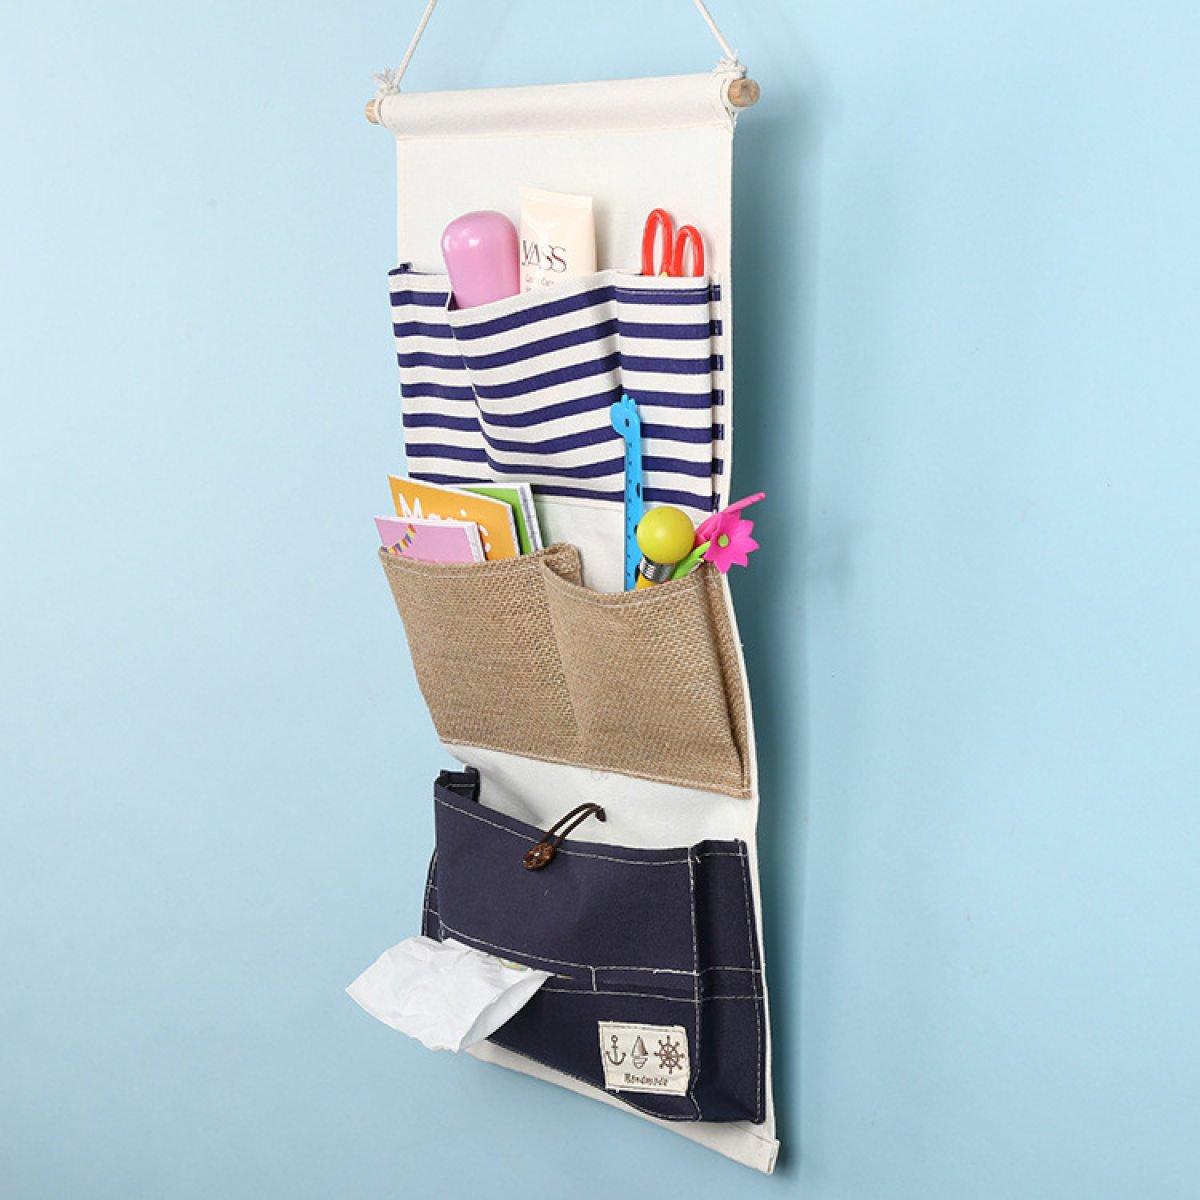 Tissue Box Navy Stripe Servietten Tasche Kordelzug Wandbehang Platzierung 11.0 21.7 In,Bluestripes